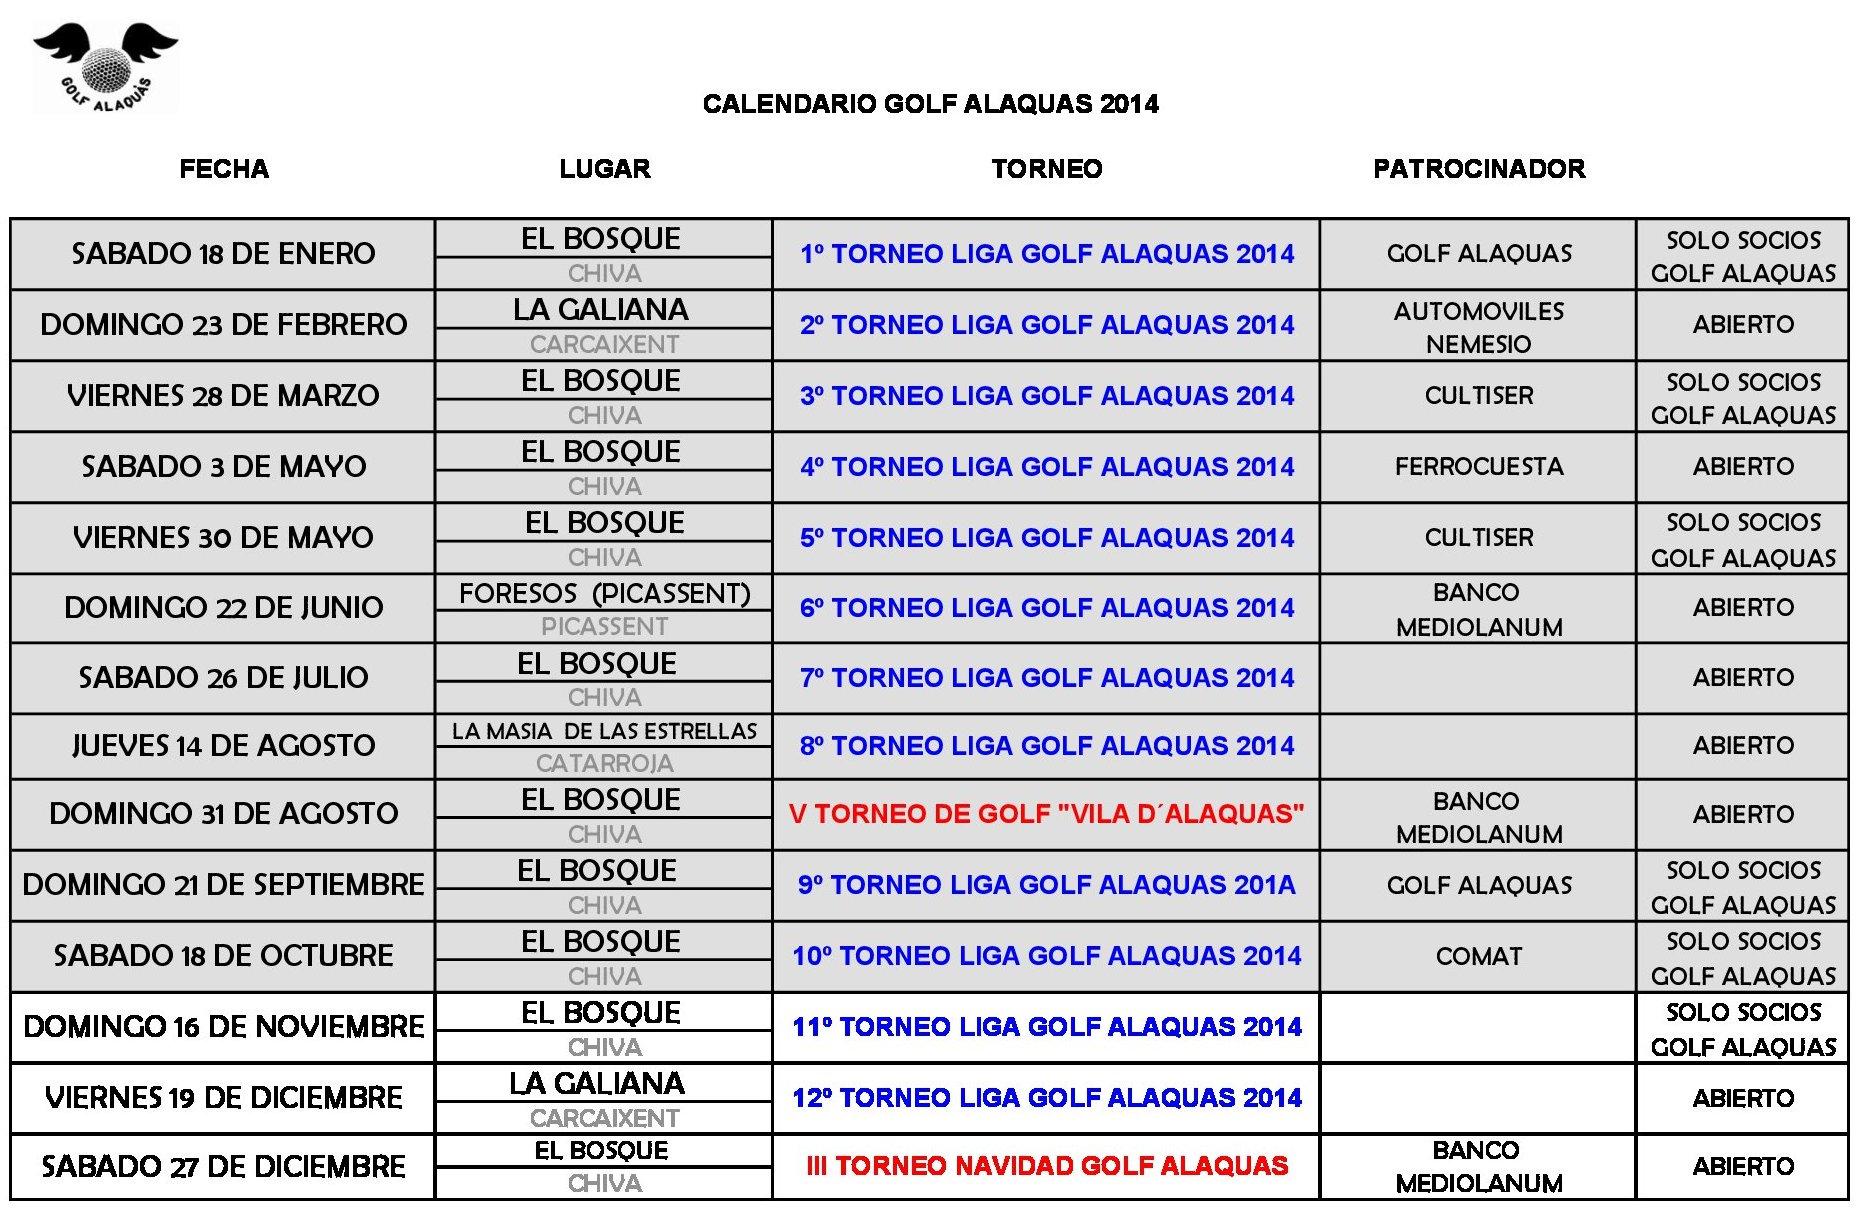 CALENDARIO_GOLF_ALAQUAS_2014 (1)